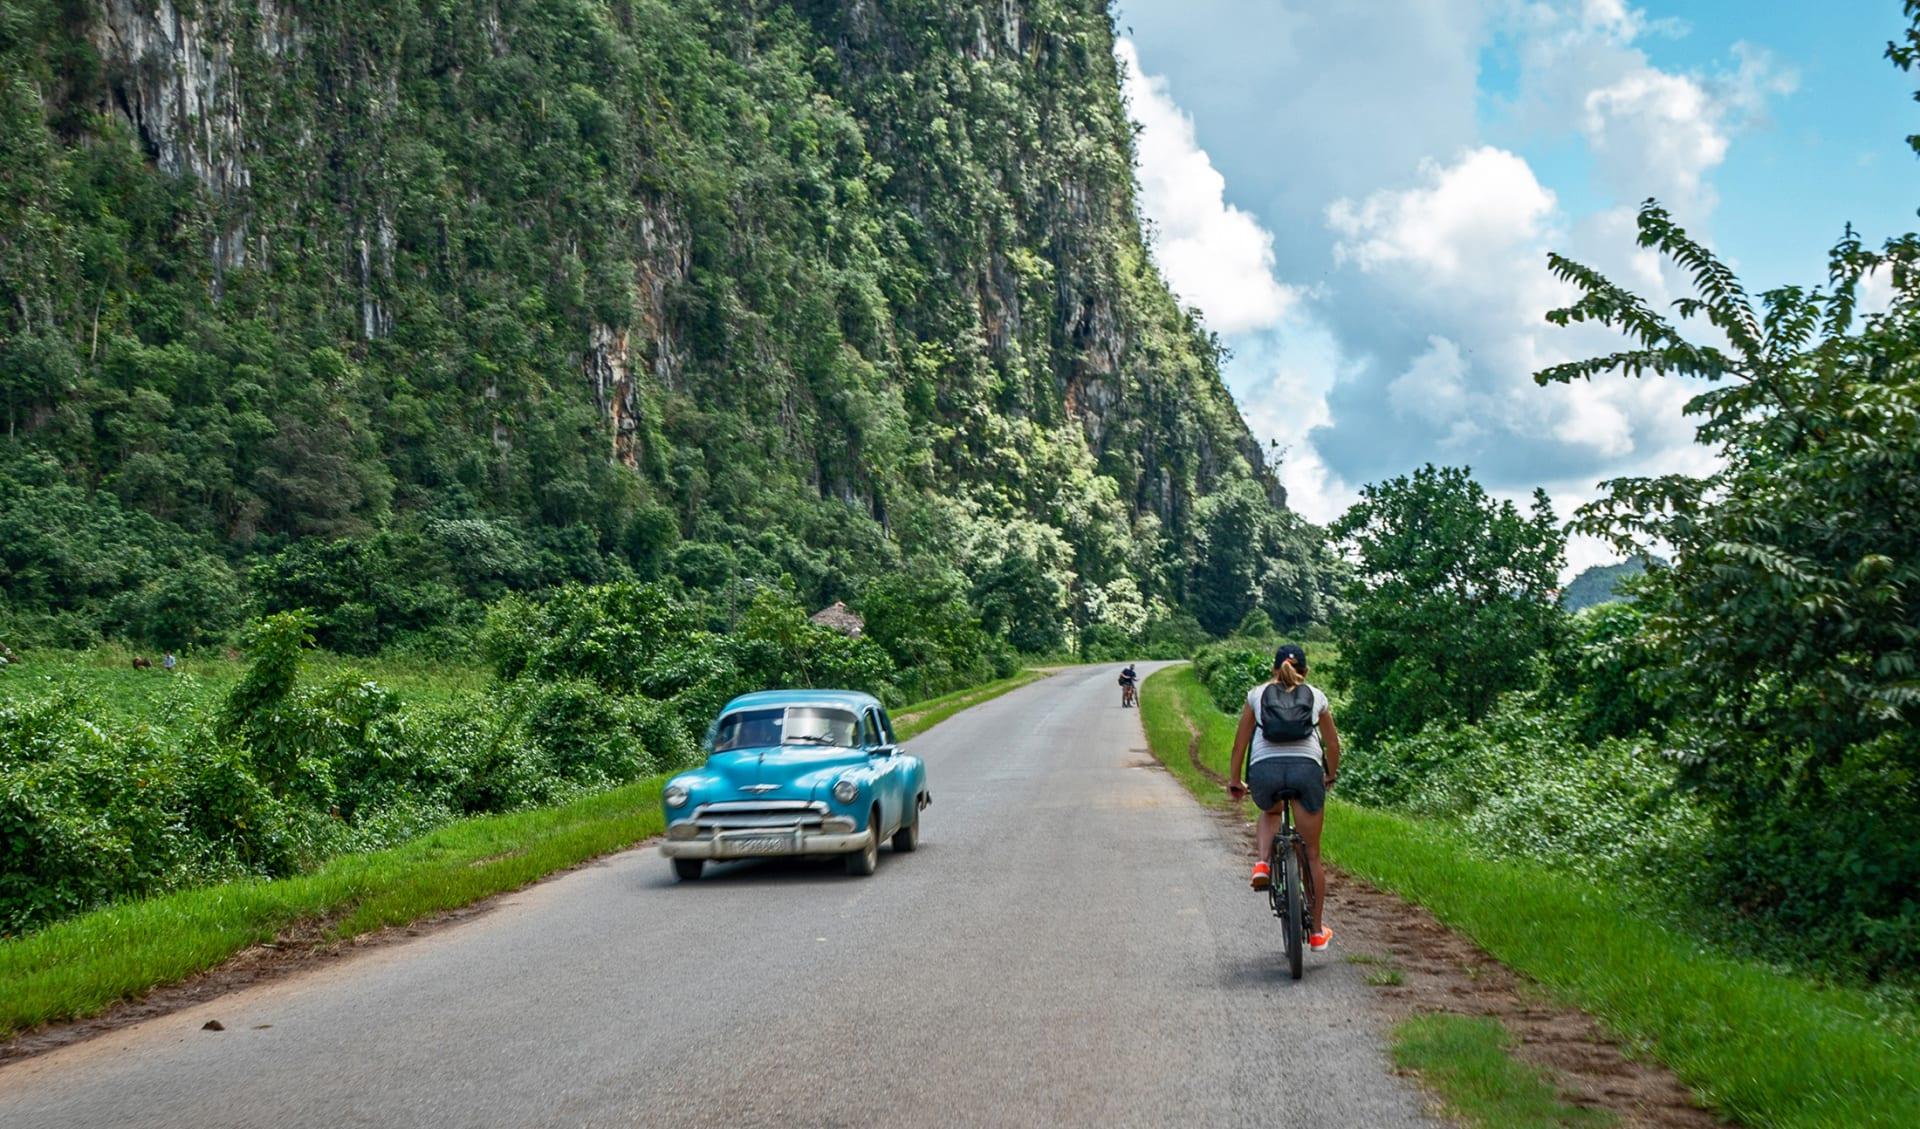 Girl riding on the bike in Viniales, Cuba